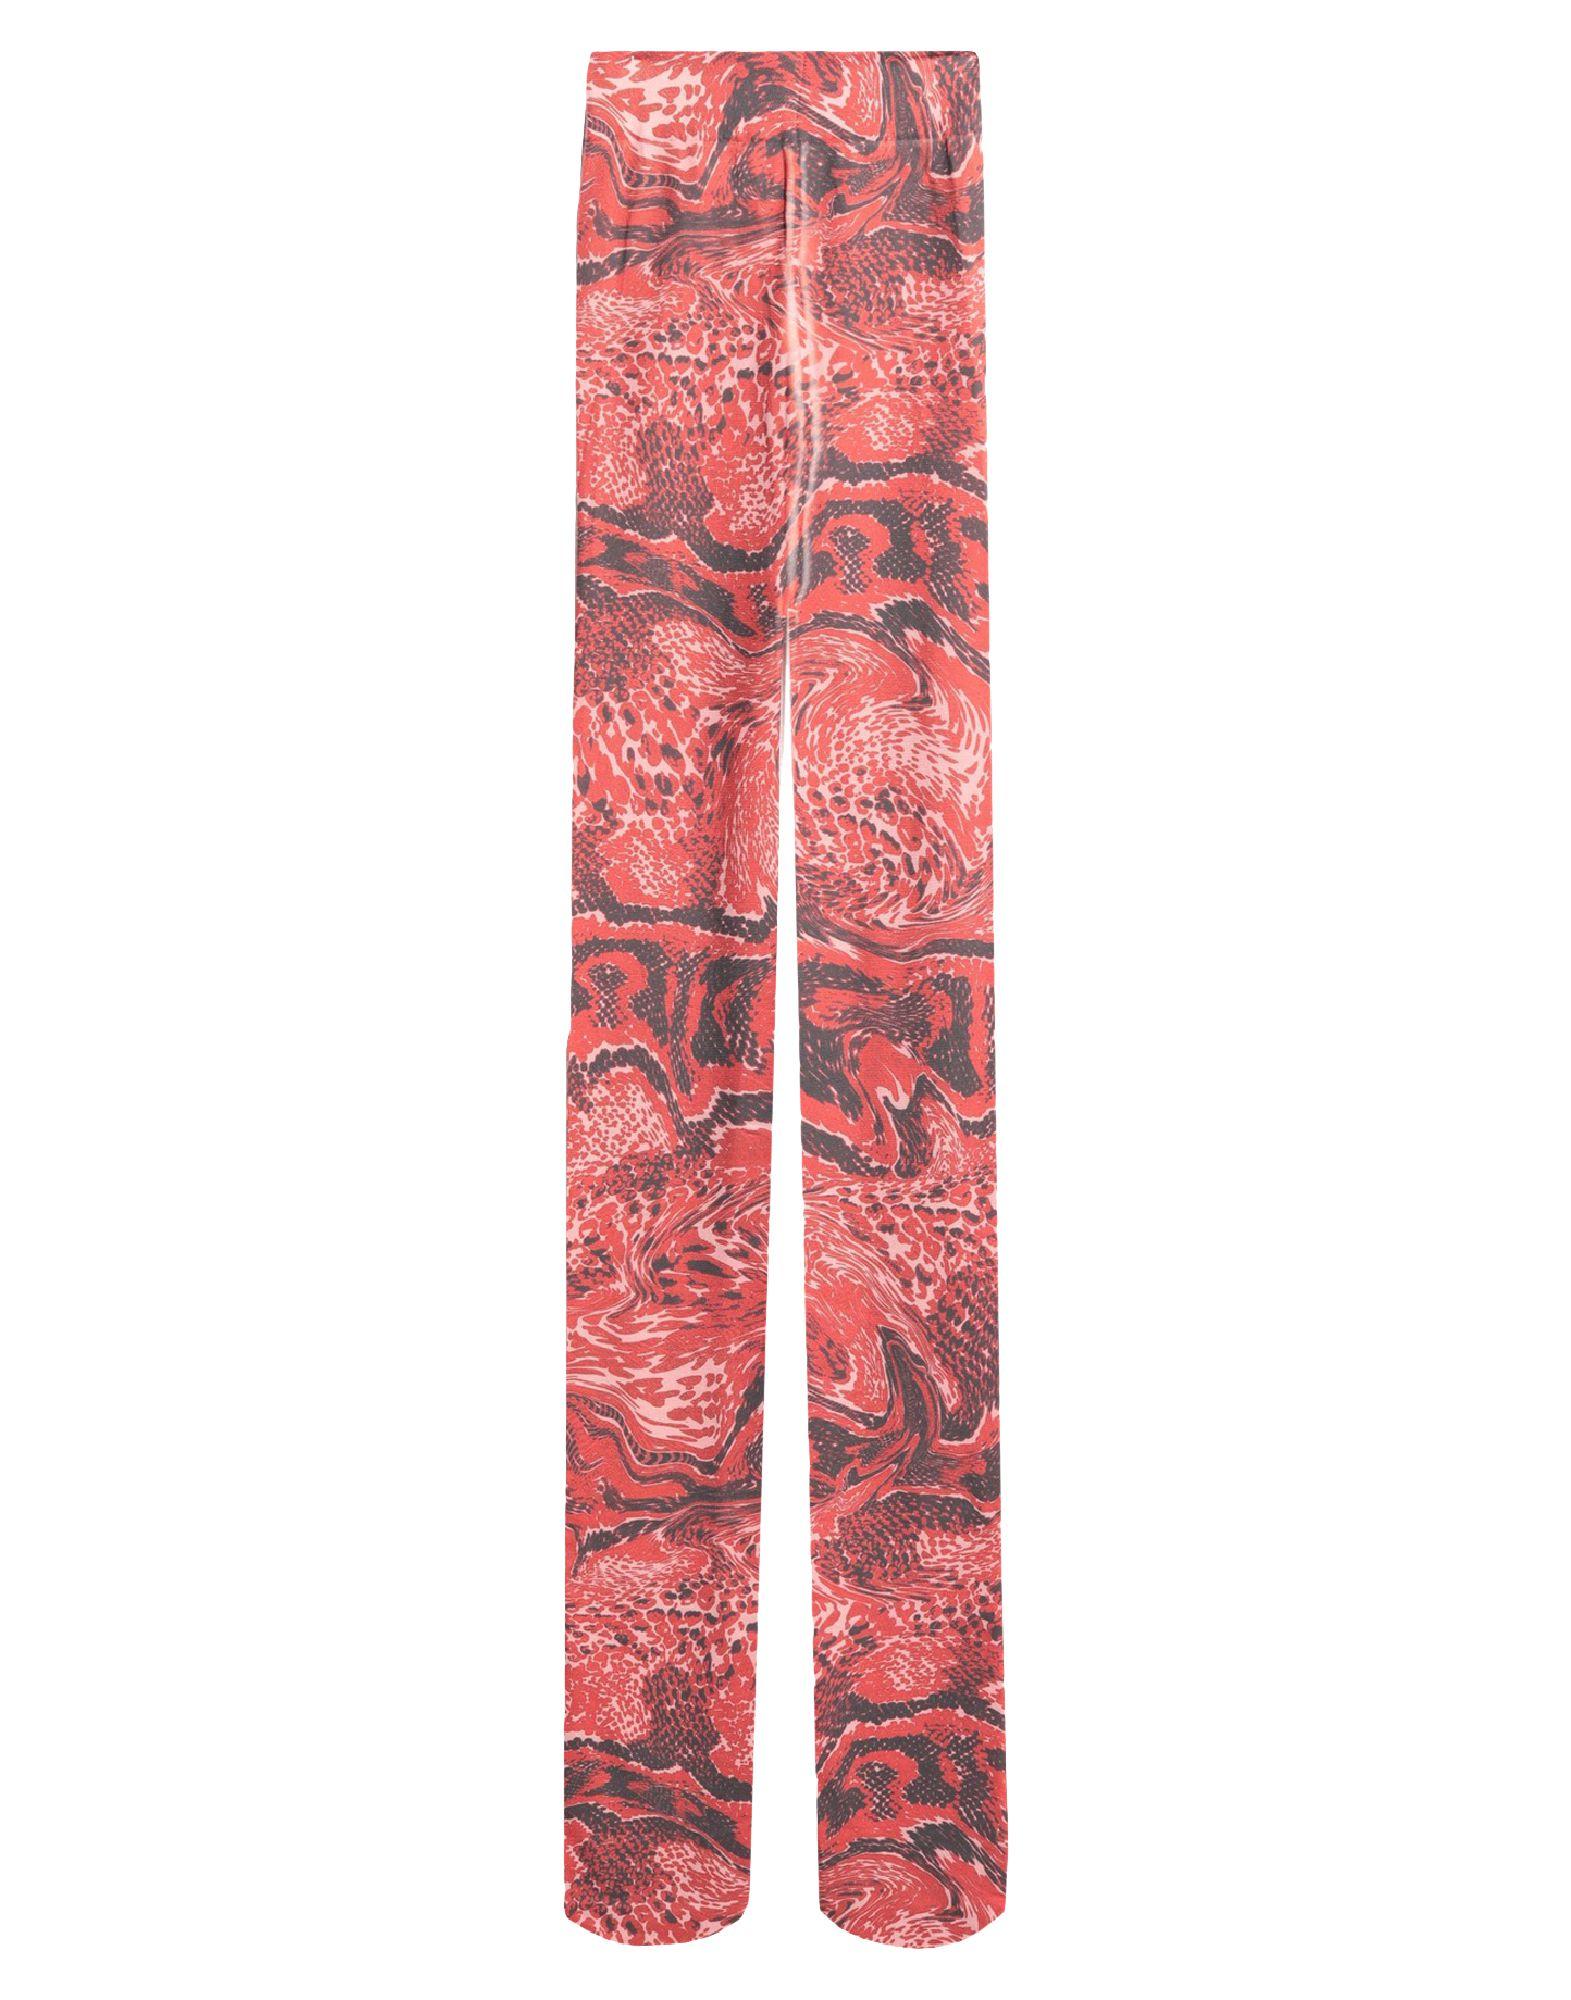 GANNI Hosiery. jersey, no appliqués, multicolor pattern, stretch. 93% Recycled polyamide, 7% Elastane